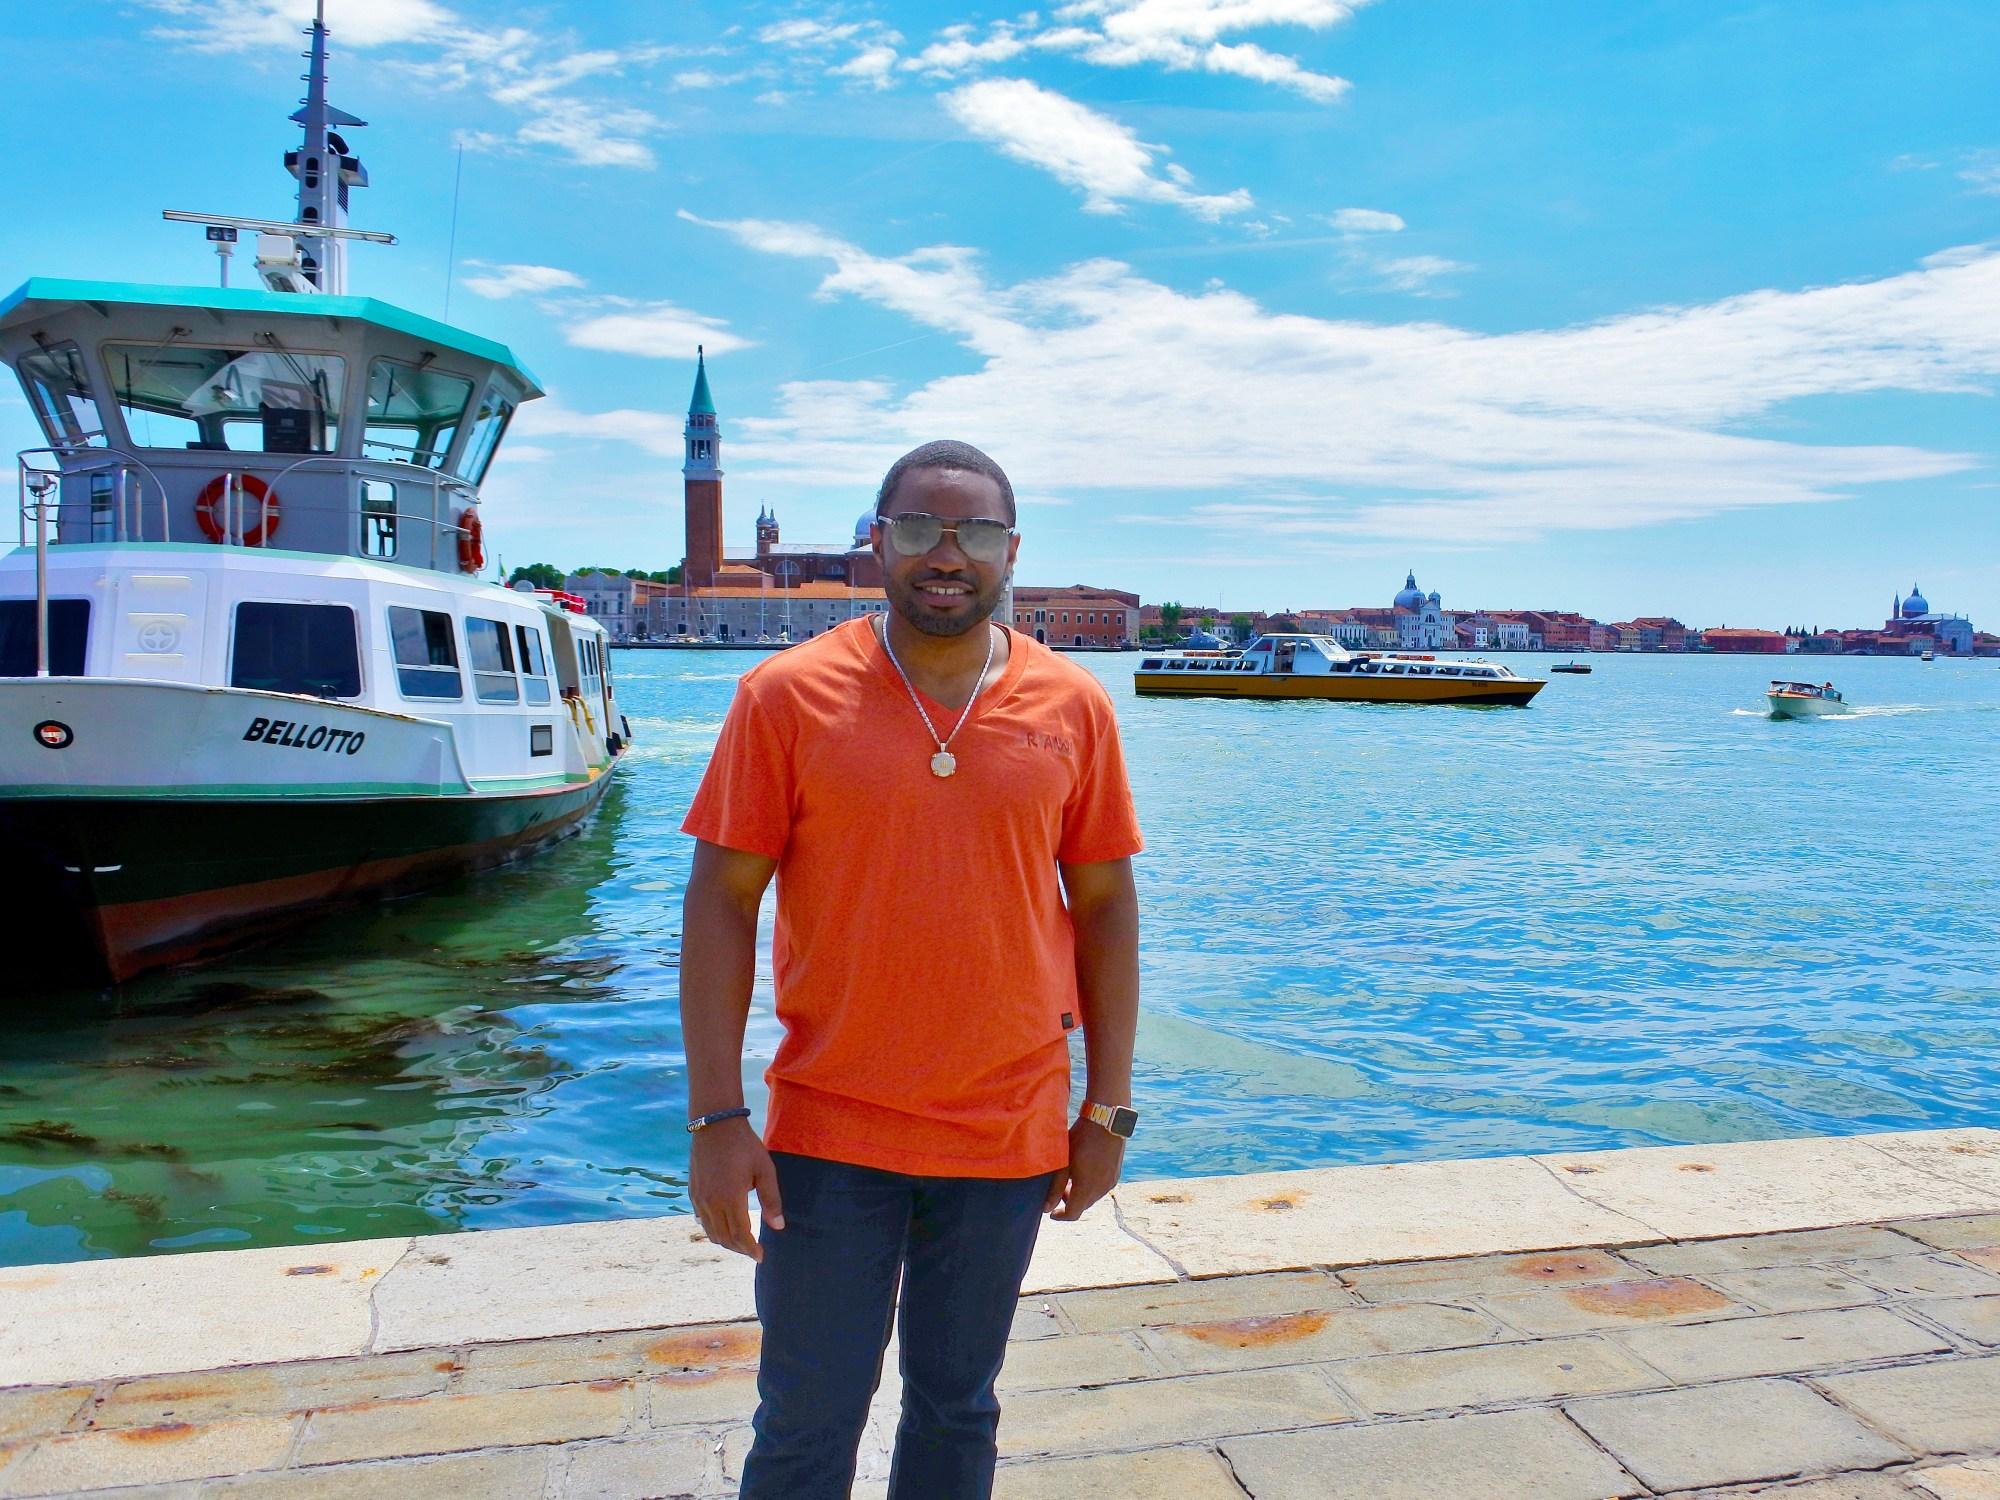 Taking in beautiful Venice Italy while wearing David Yurman, G-Star Raw, Louis Vuitton, LaPrairie Celebritiy Musician, Producer, Influencer Tyrone Smith